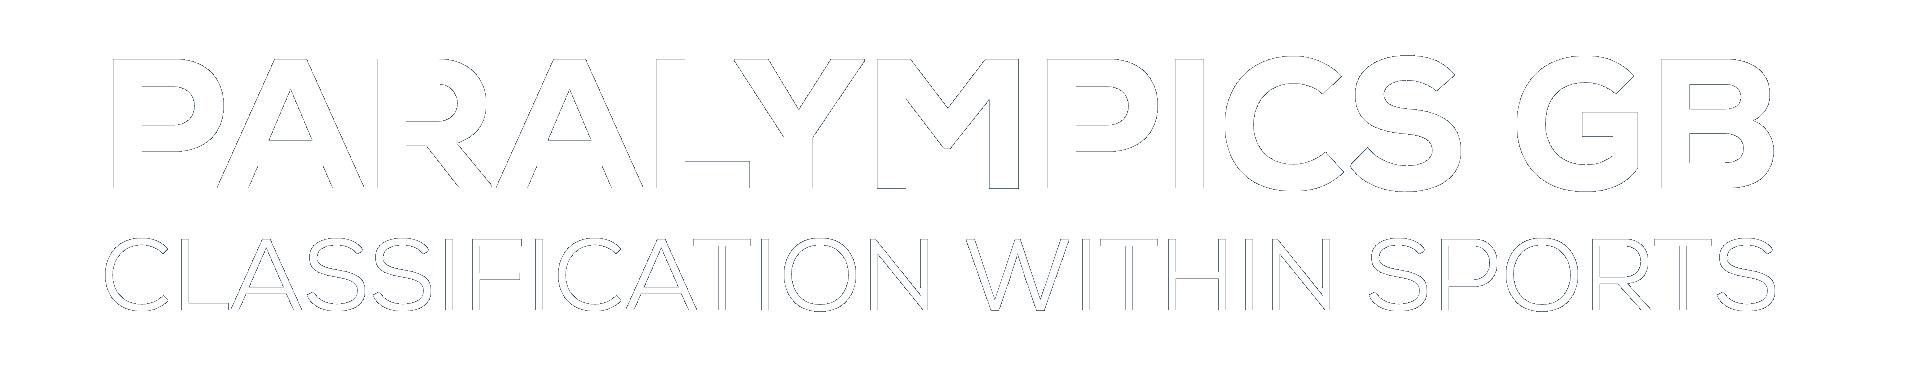 paralympics GB title